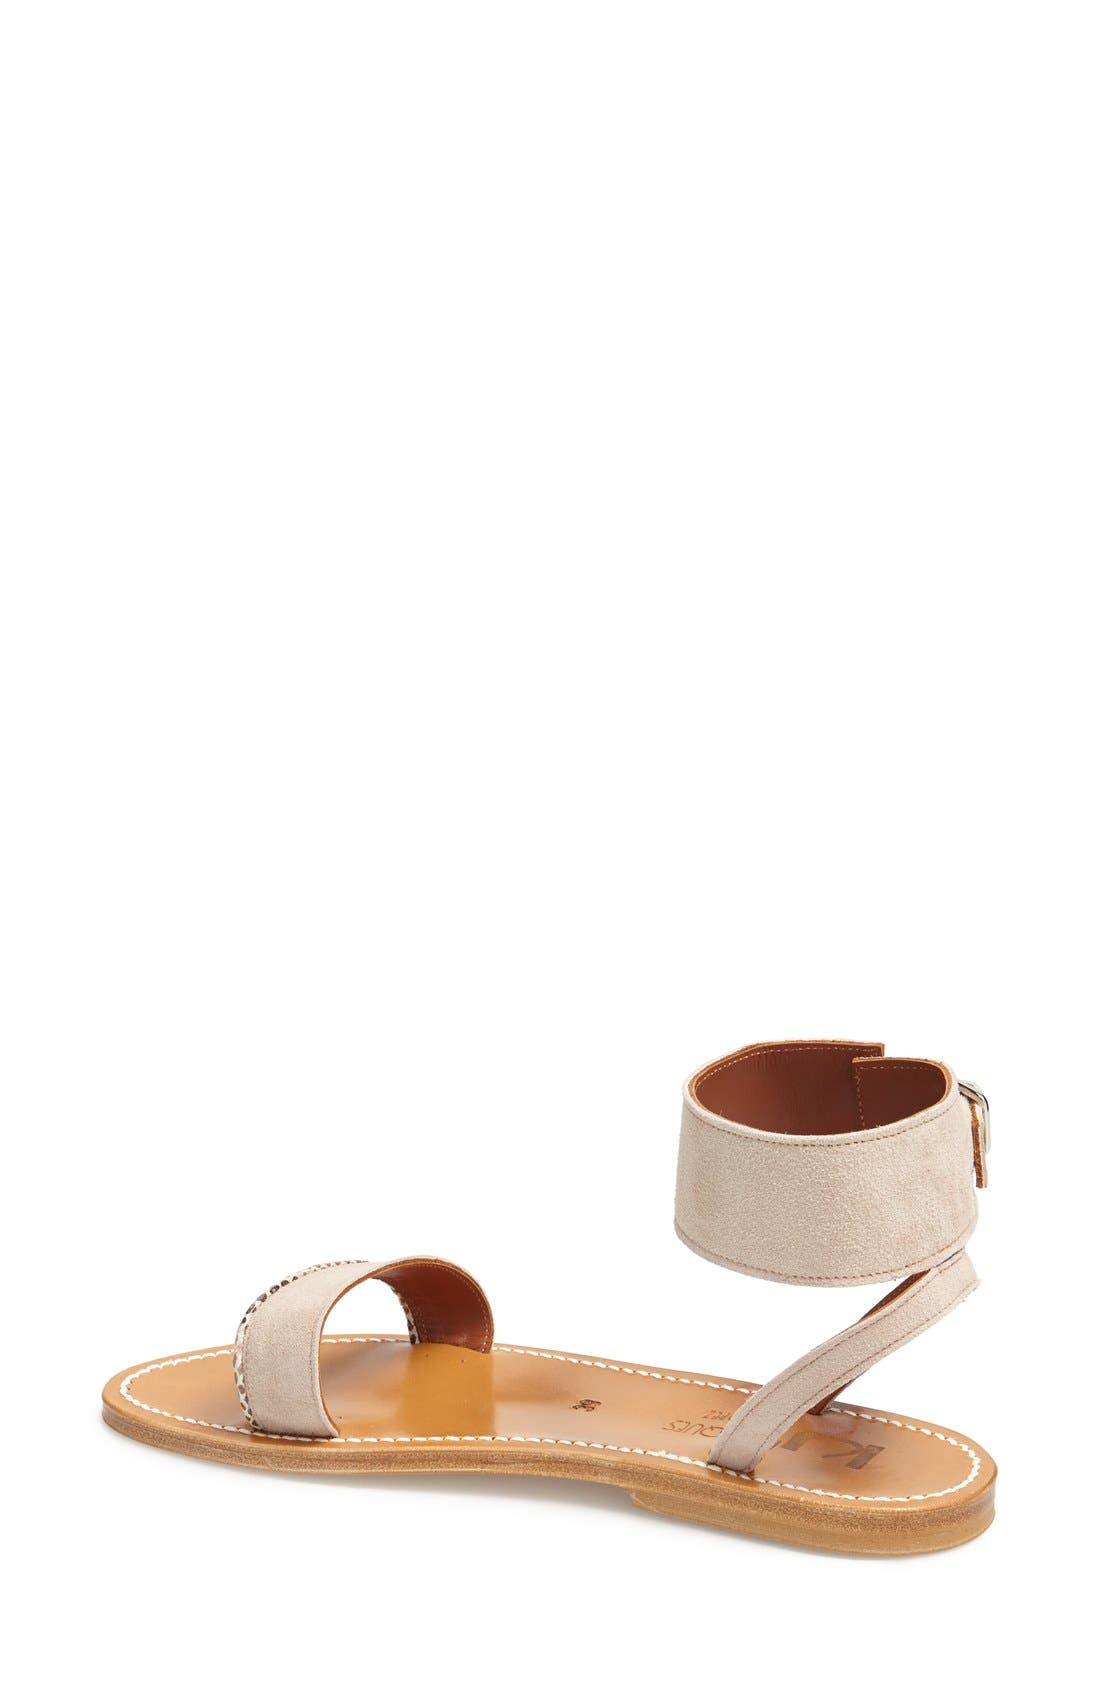 Alternate Image 2  - K.Jacques St. Tropez 'Saratoga' Ankle Strap Sandal